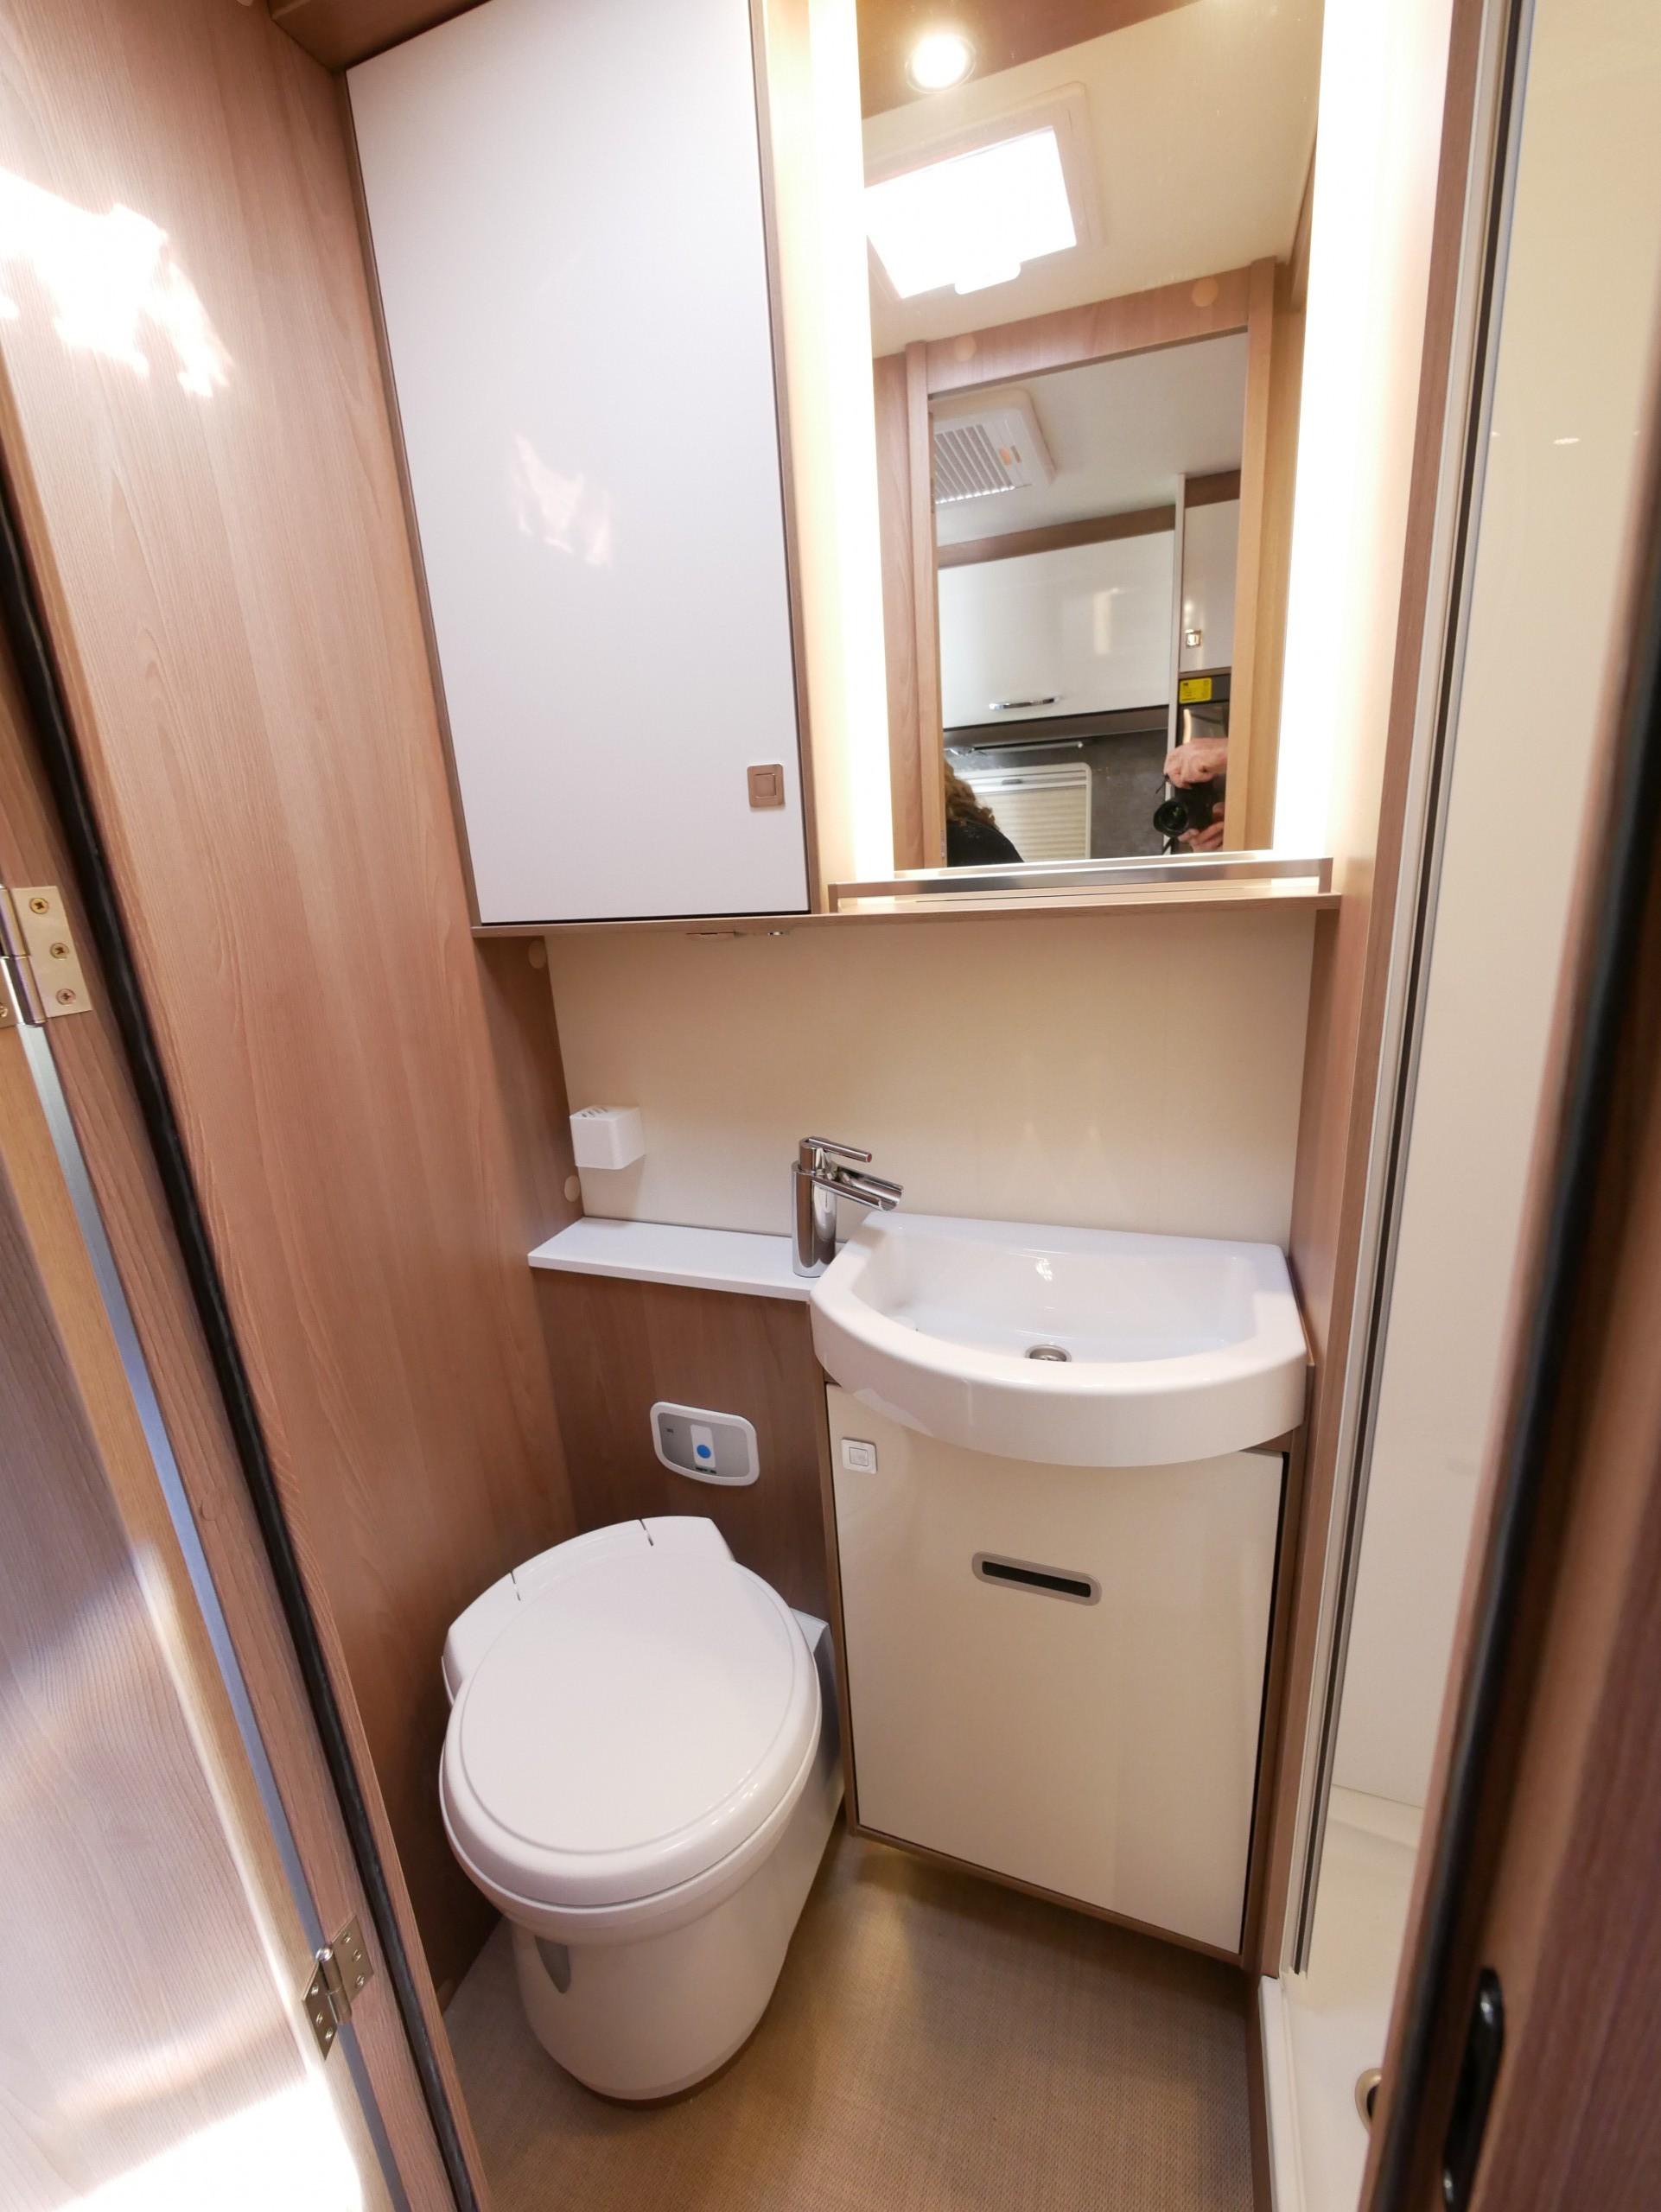 Pedestal cassette toilet with 12V electric flush, lots of storage